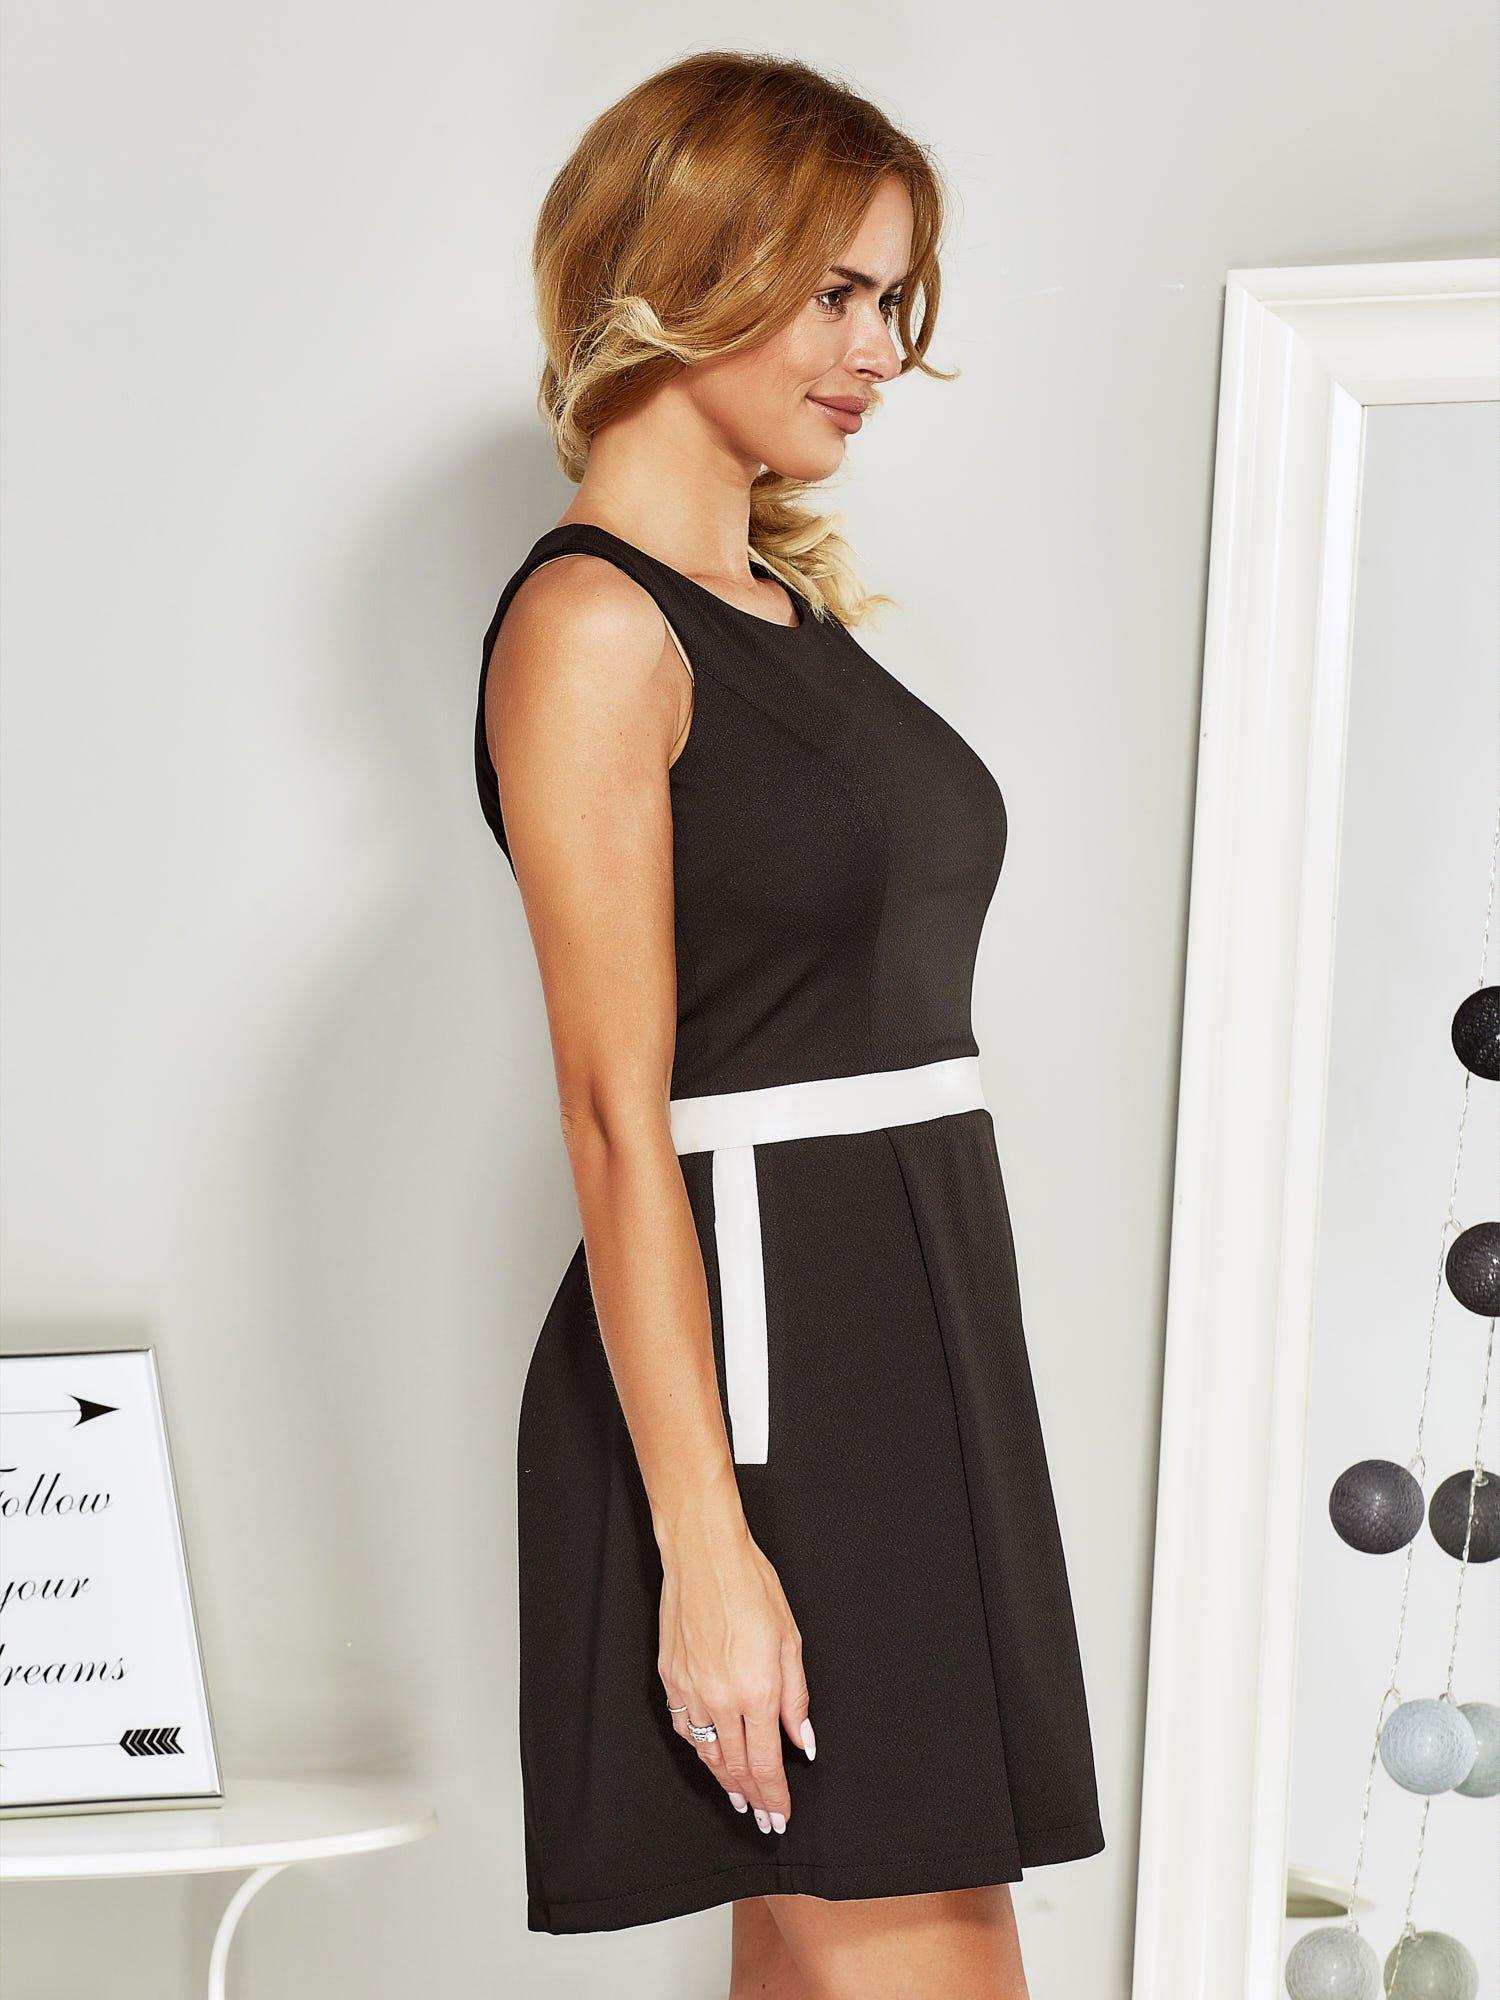 7bd74bf4a5 Czarna sukienka koktajlowa ze skórzaną wstawką - Sukienka koktajlowa ...